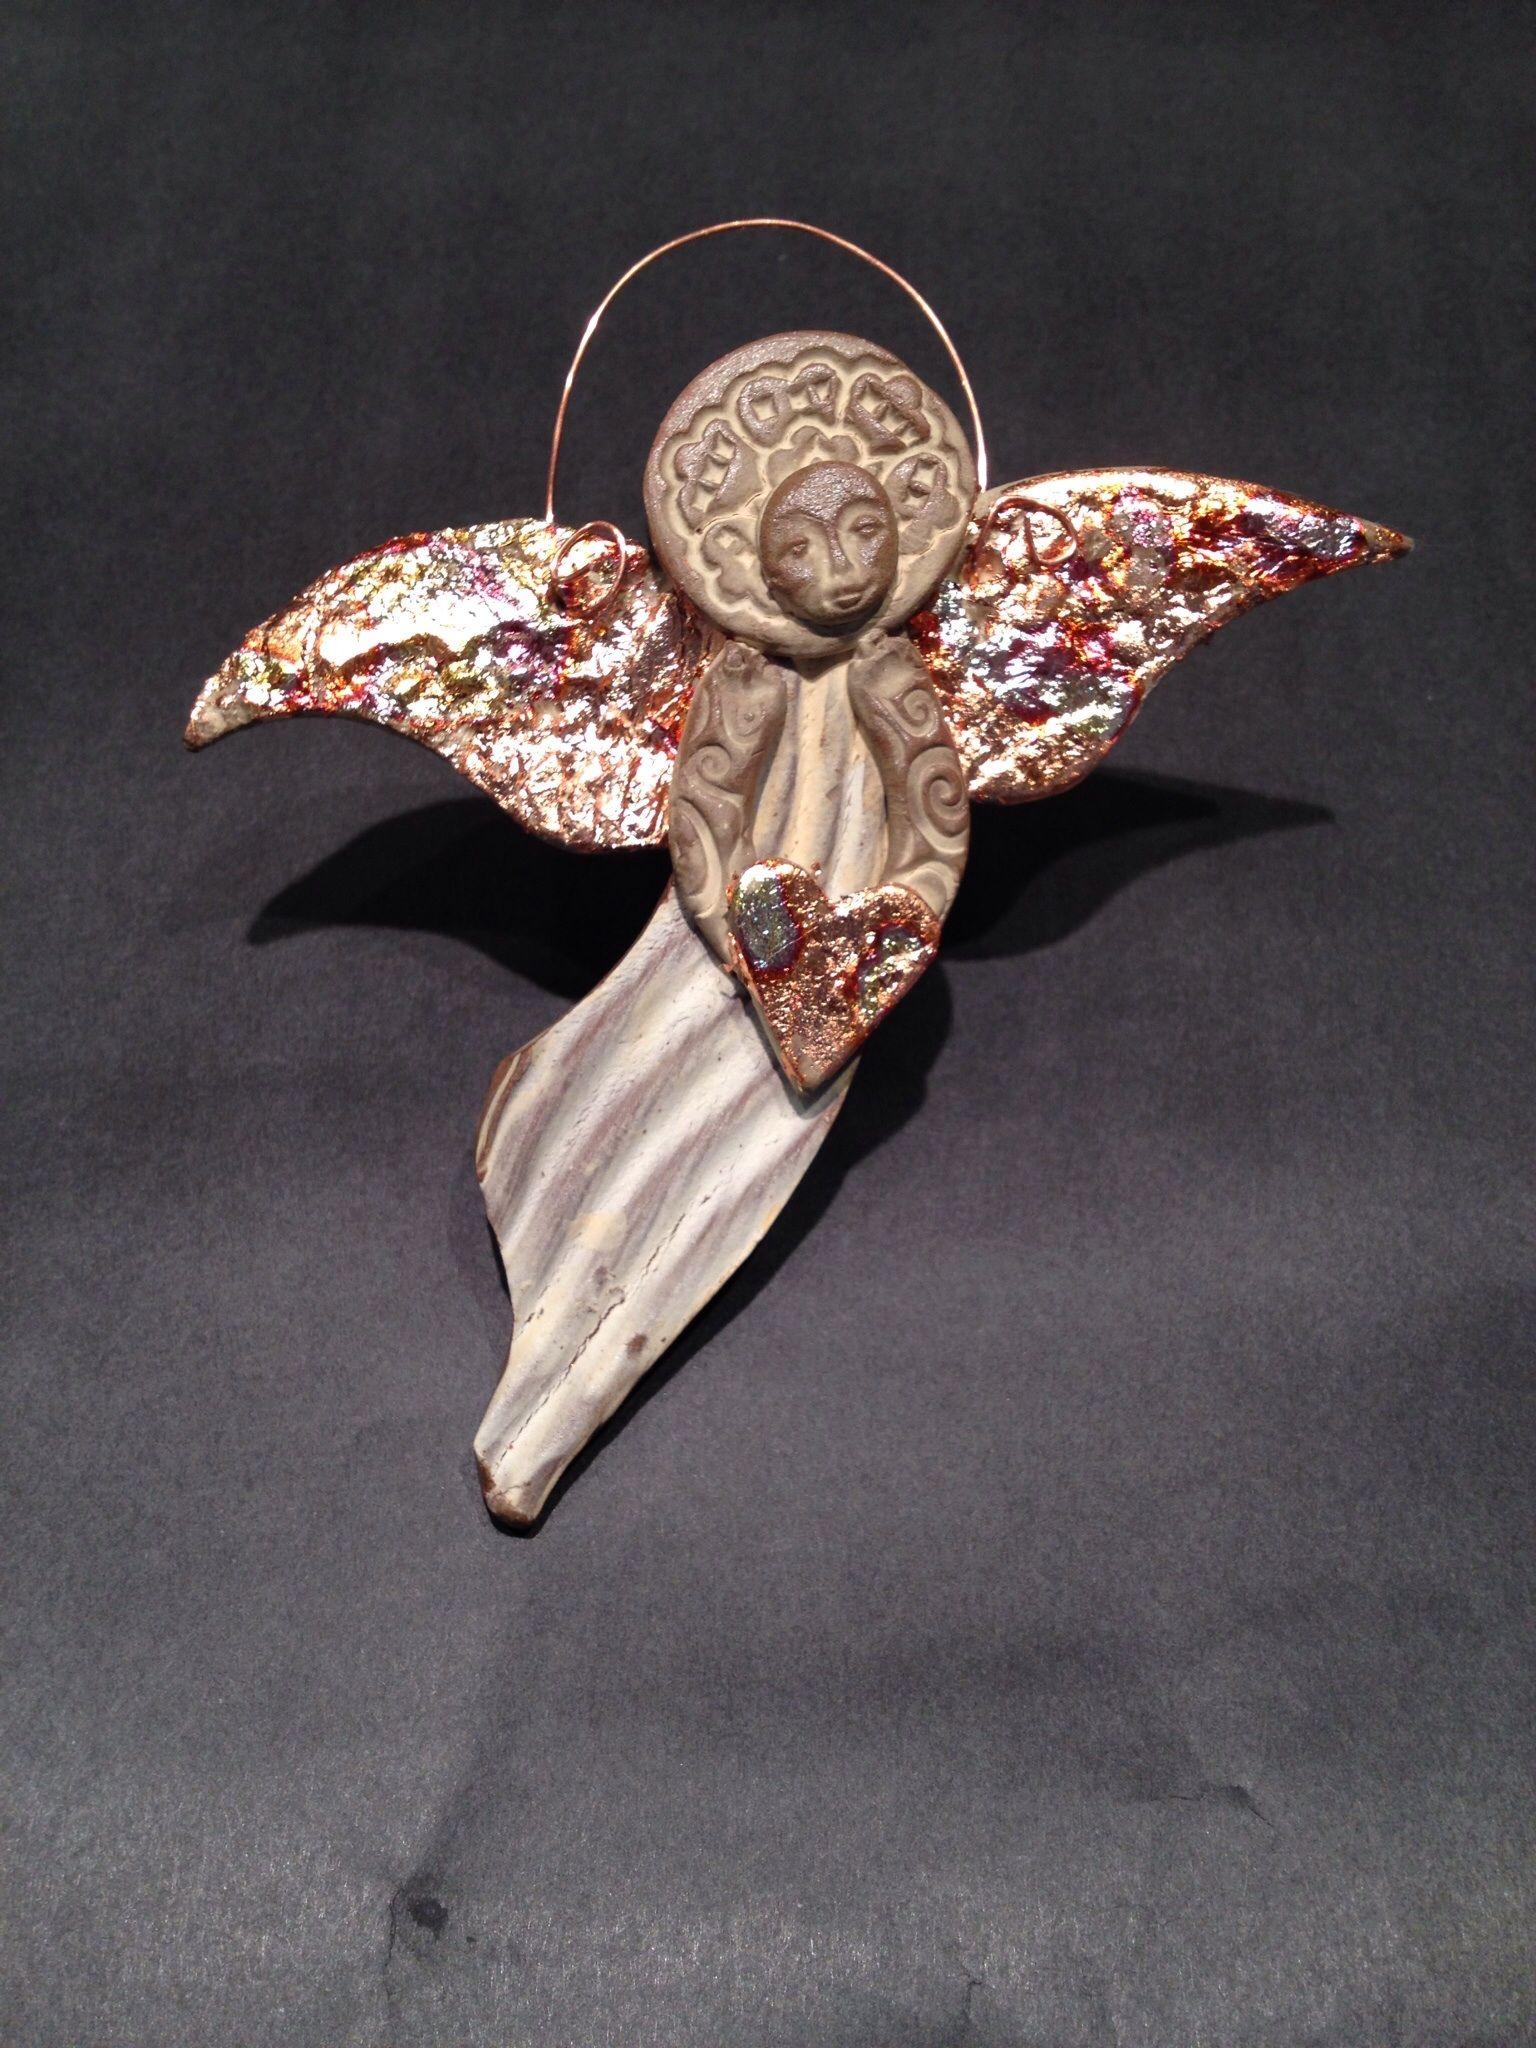 Pin By Laura Zolezzi Salinas On Ceramics Pottery Angels Clay Angel Angel Ornaments